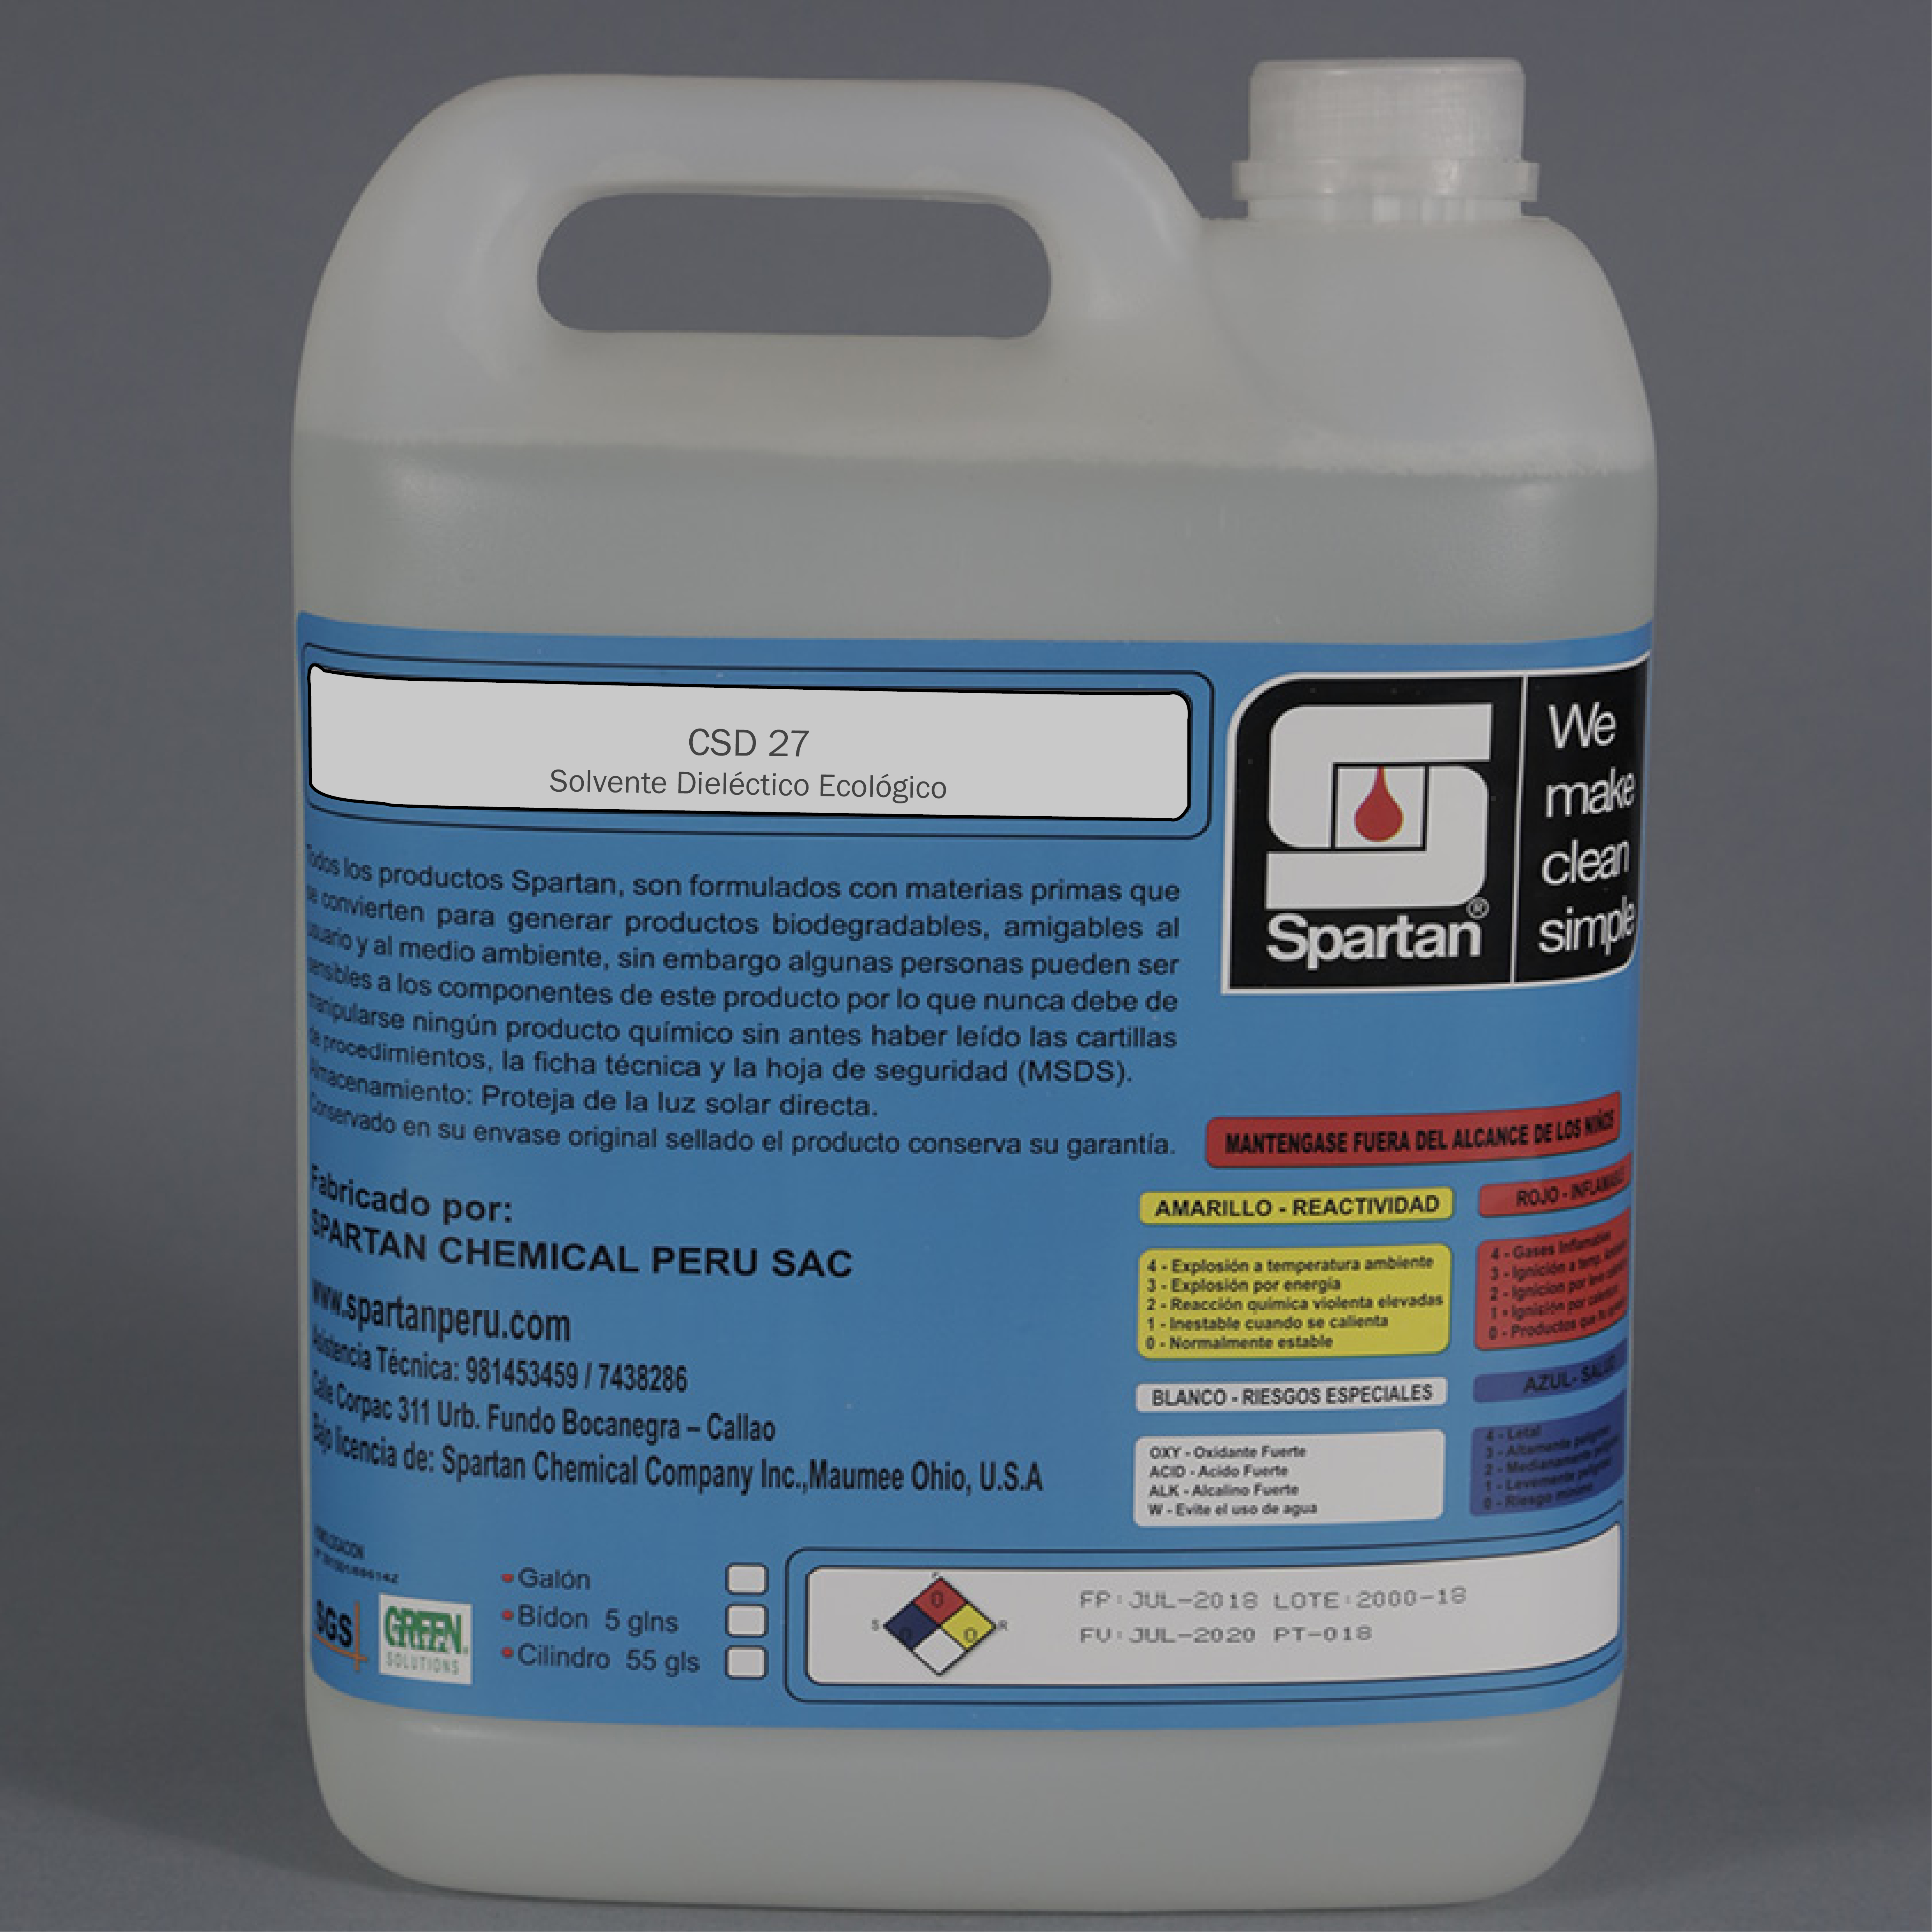 CSD 27 – Solvente dieléctrico ecológico